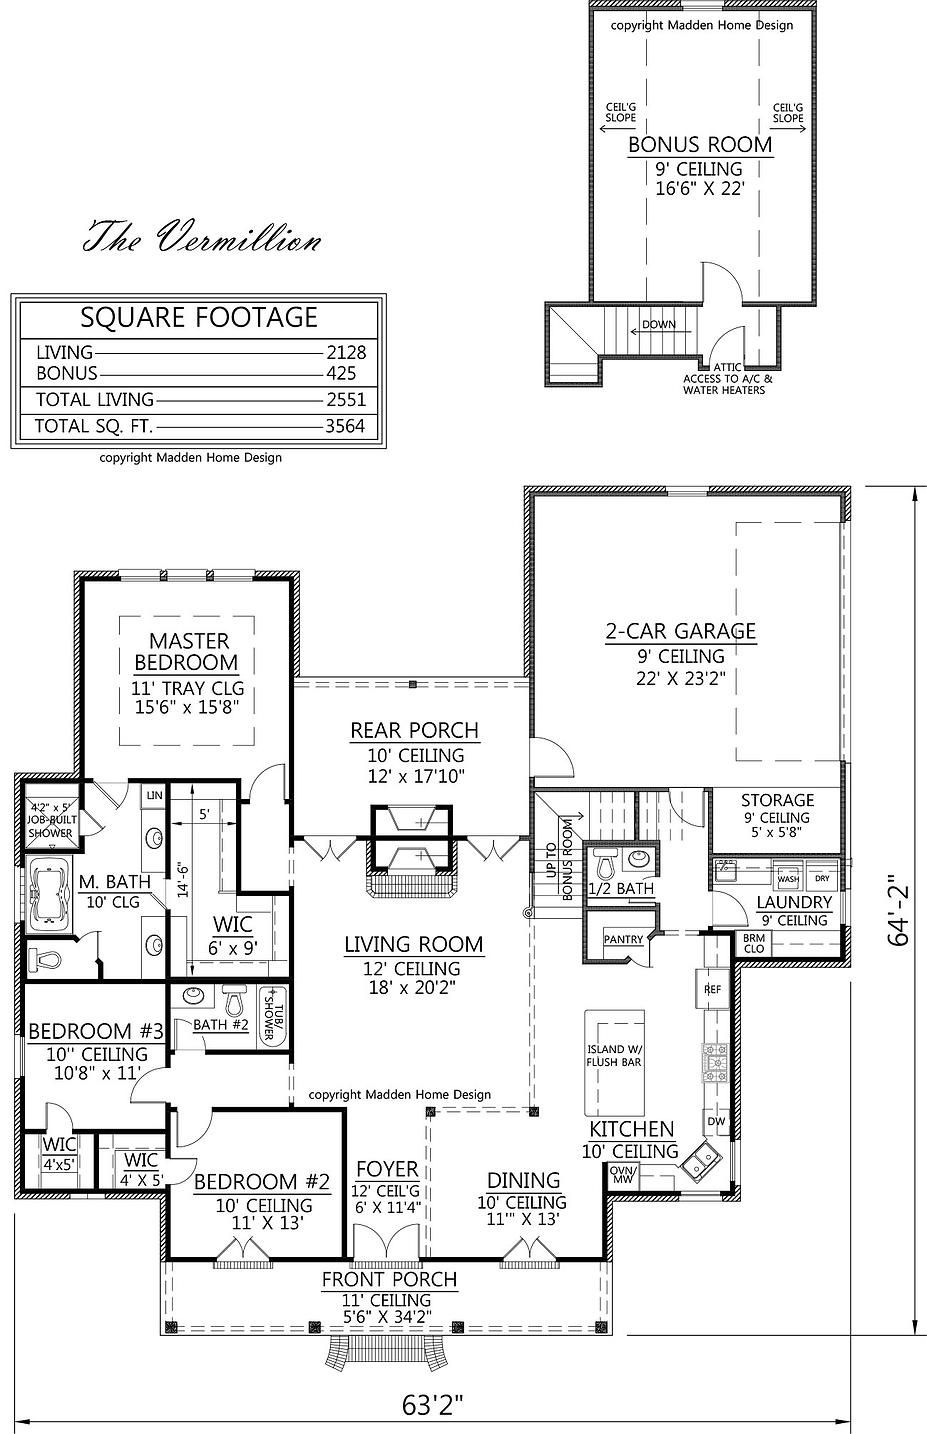 Madden Home Design - The Vermillion   Home   Pinterest   Acadian ...